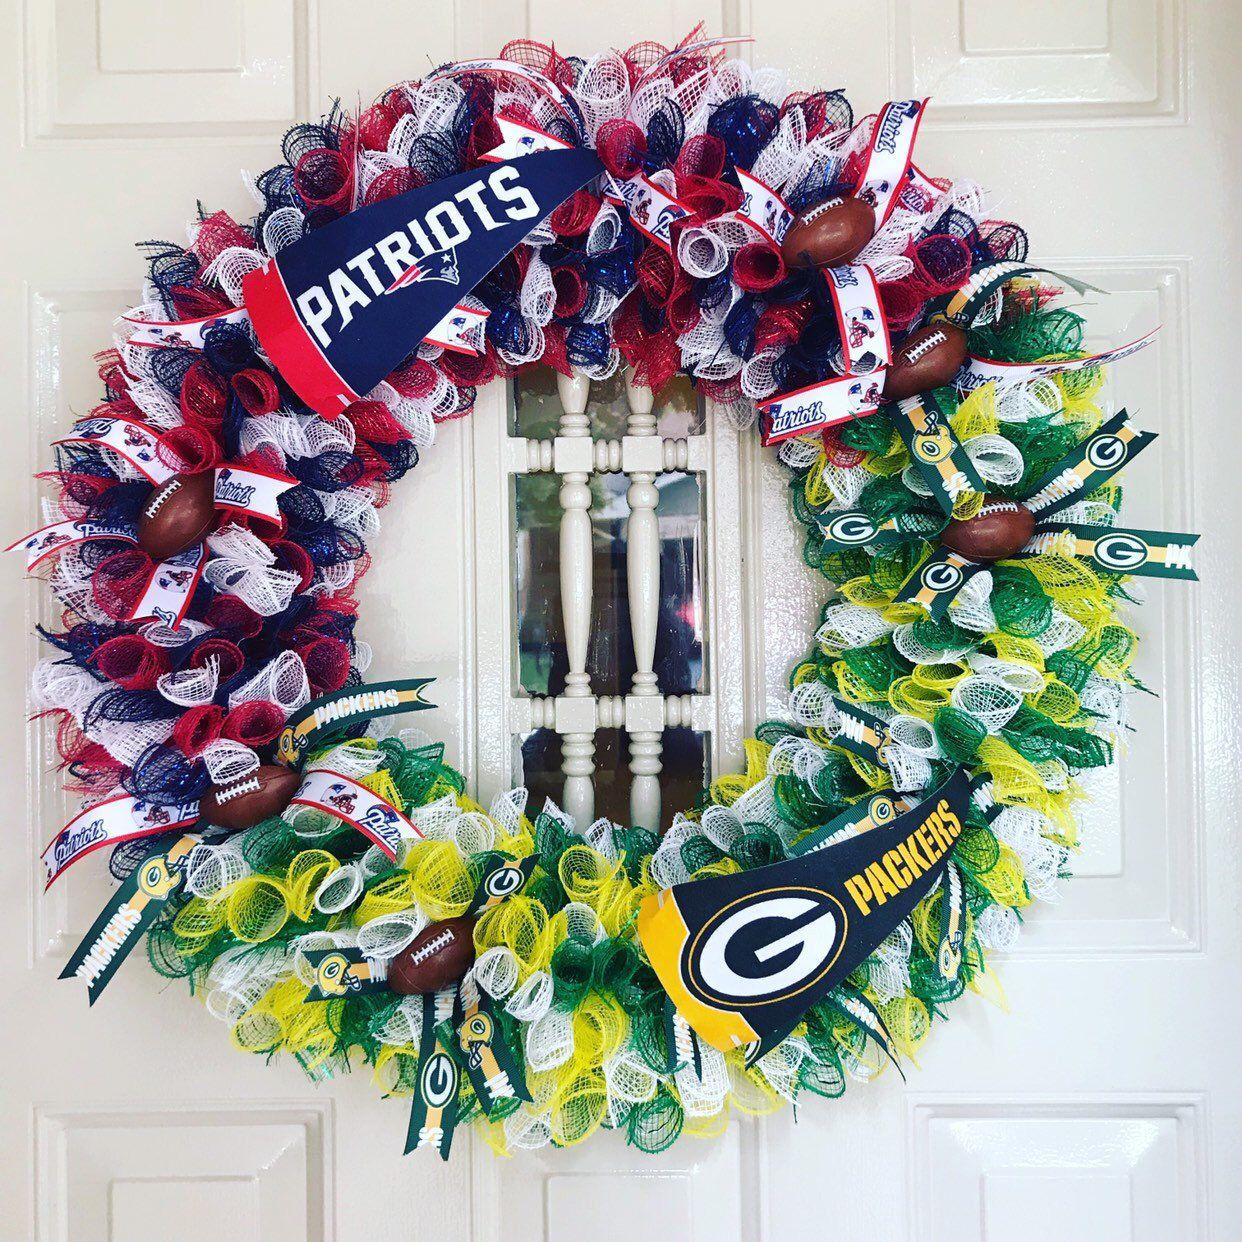 Arkansas-Saints-Packers-FSU-Ole Miss-Baylor-Florida Team Wreath-Football Wreath NFL-Pick your team Wreath-Dallas-Patriots-Ohio-Alabama-Lsu